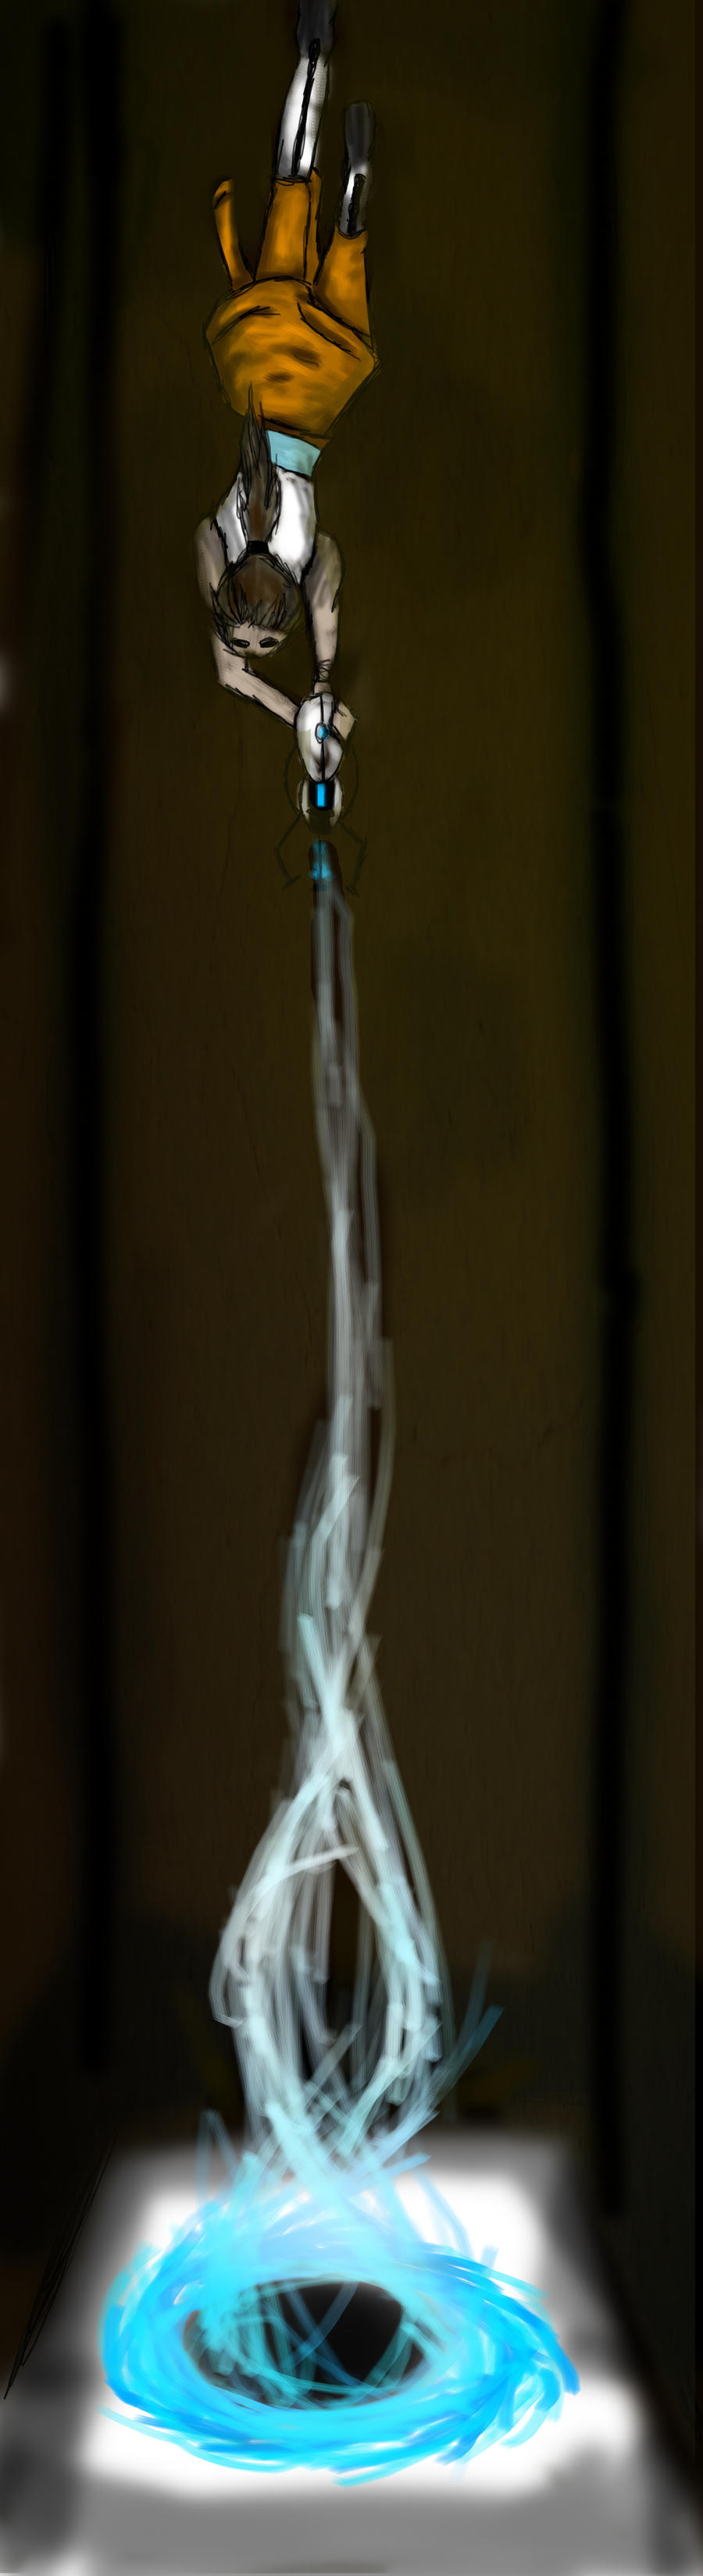 The Narbacular Drop by dragontamer75